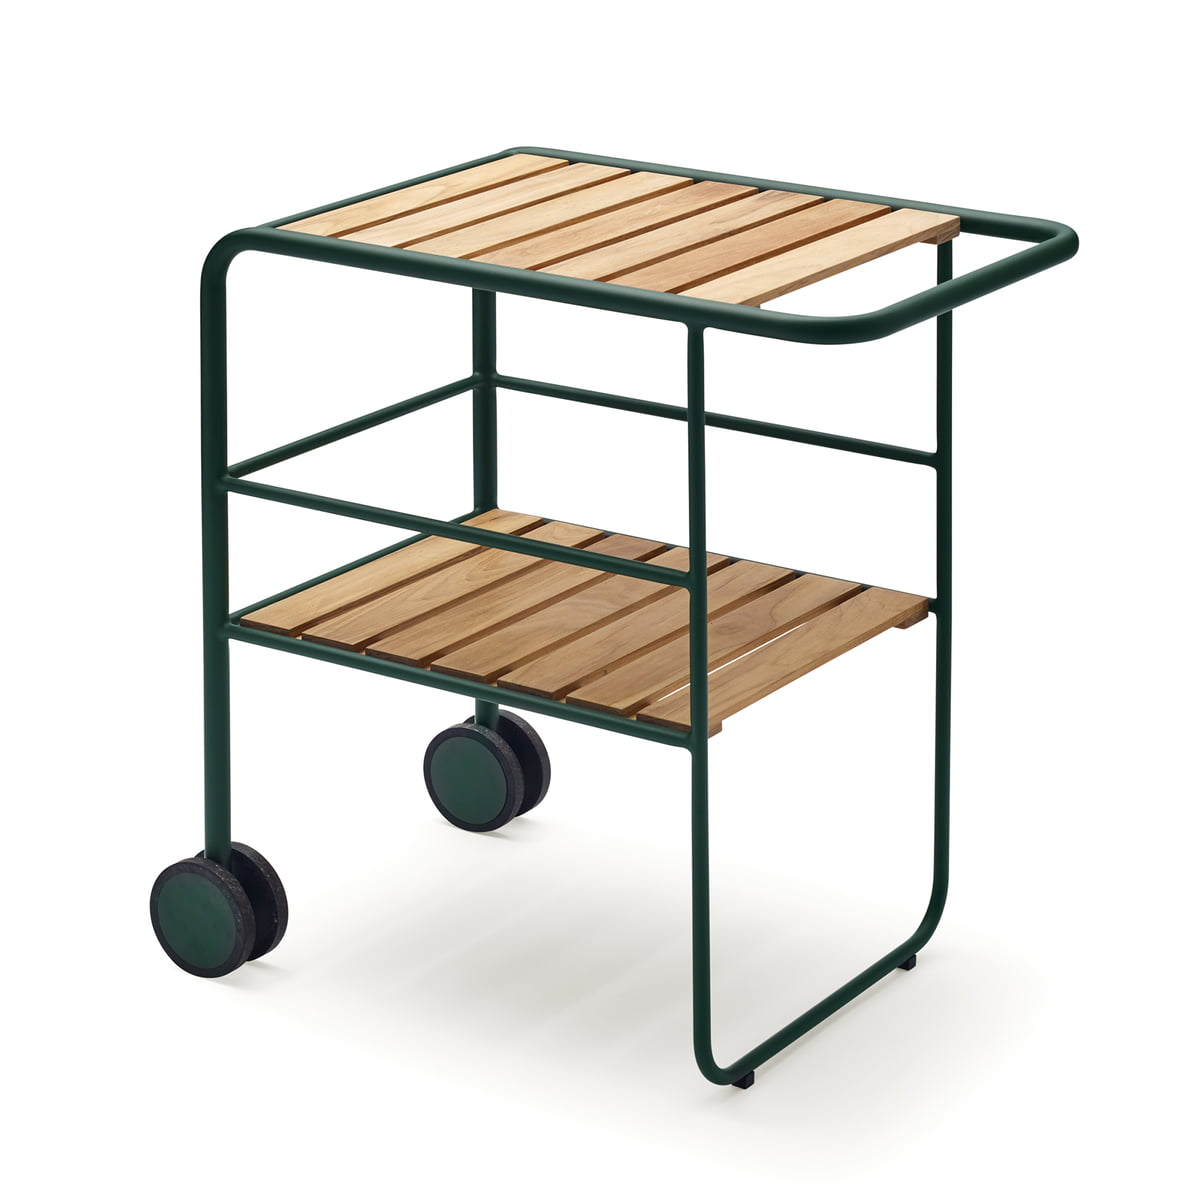 Skagerak - Fuori Servierwagen, jagdgrün / Teakholz | Küche und Esszimmer > Servierwagen | Jagdgrün | Aluminum -  teakholz | Skagerak